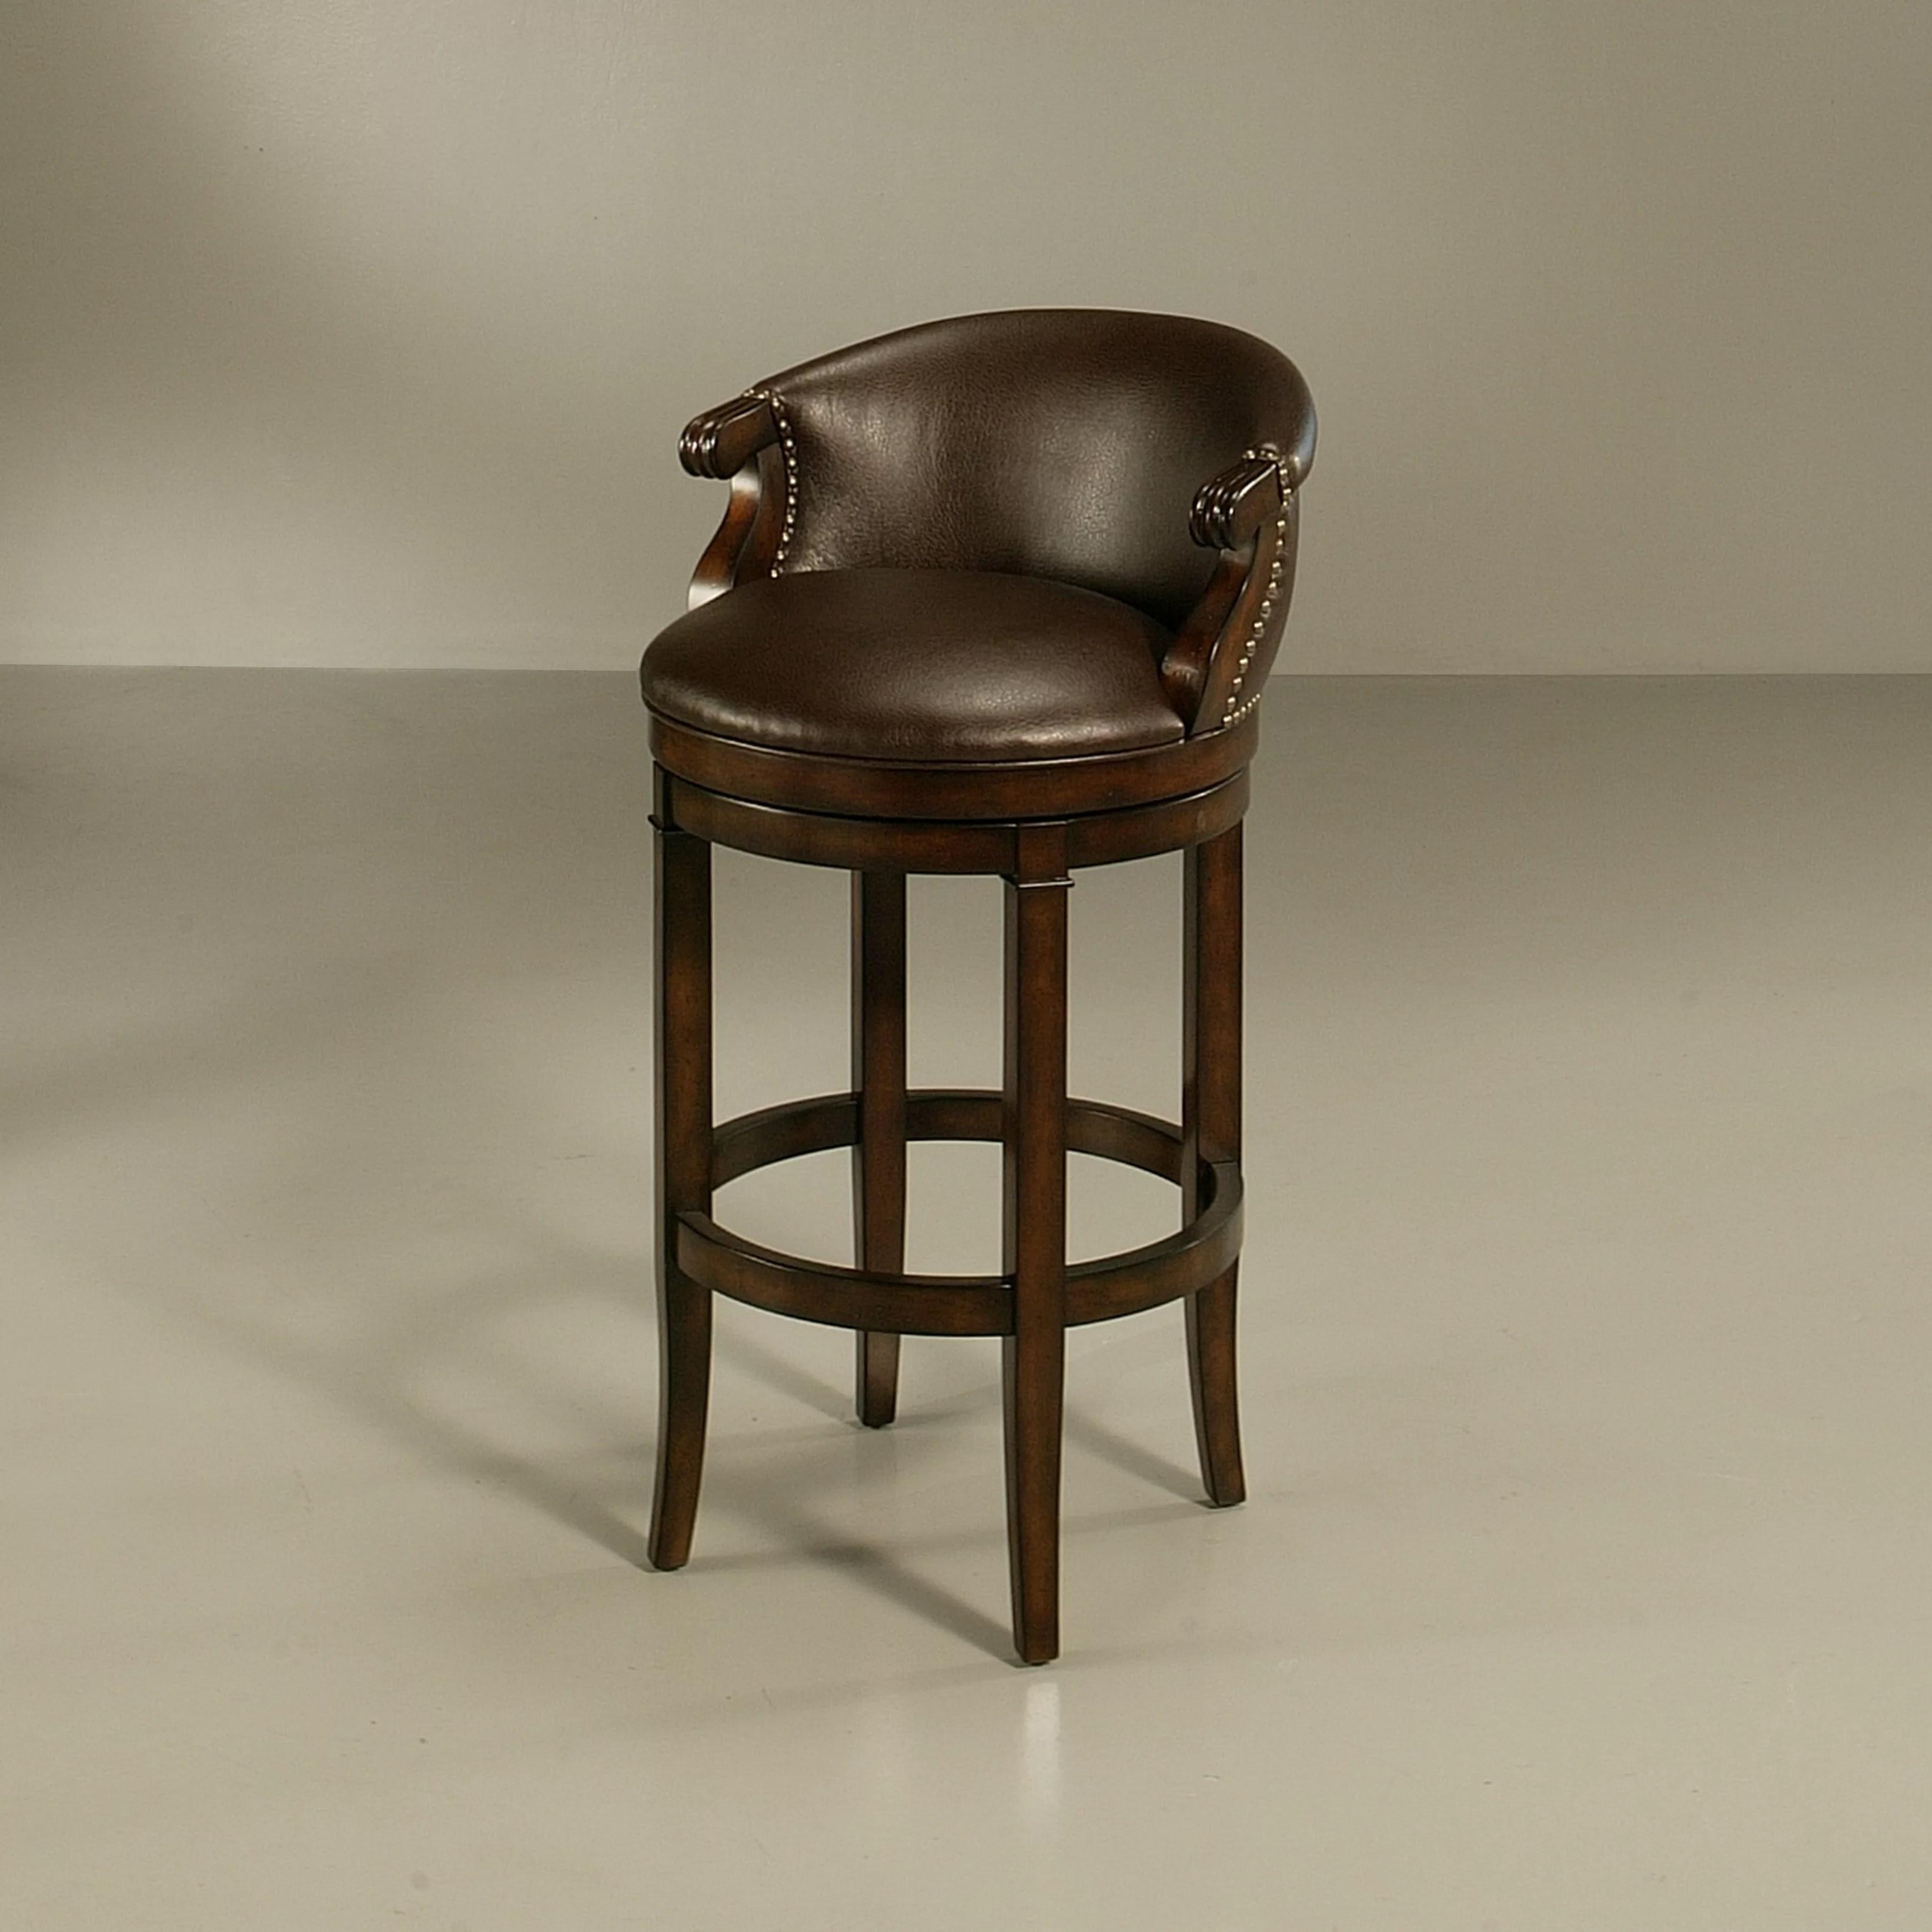 wayfair kitchen stools mandolin slicer impacterra princetown 26 5 quot swivel bar stool and reviews